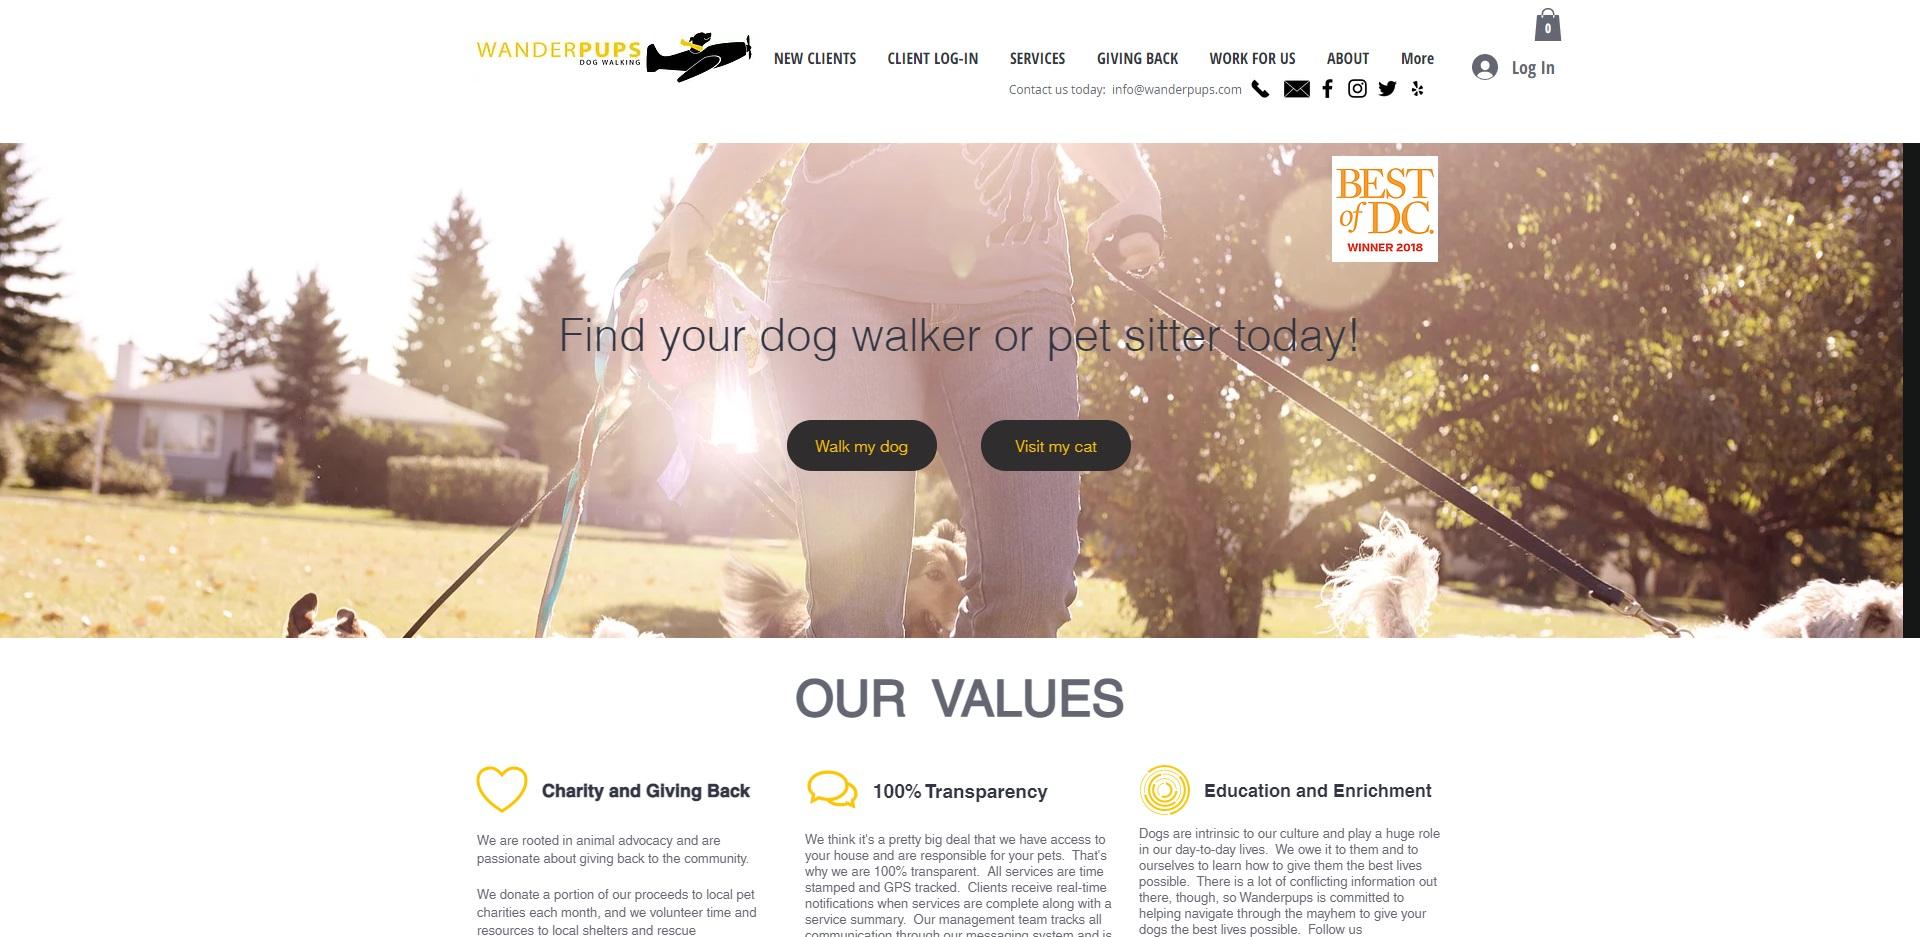 Best Dog Walkers in Washington, DC